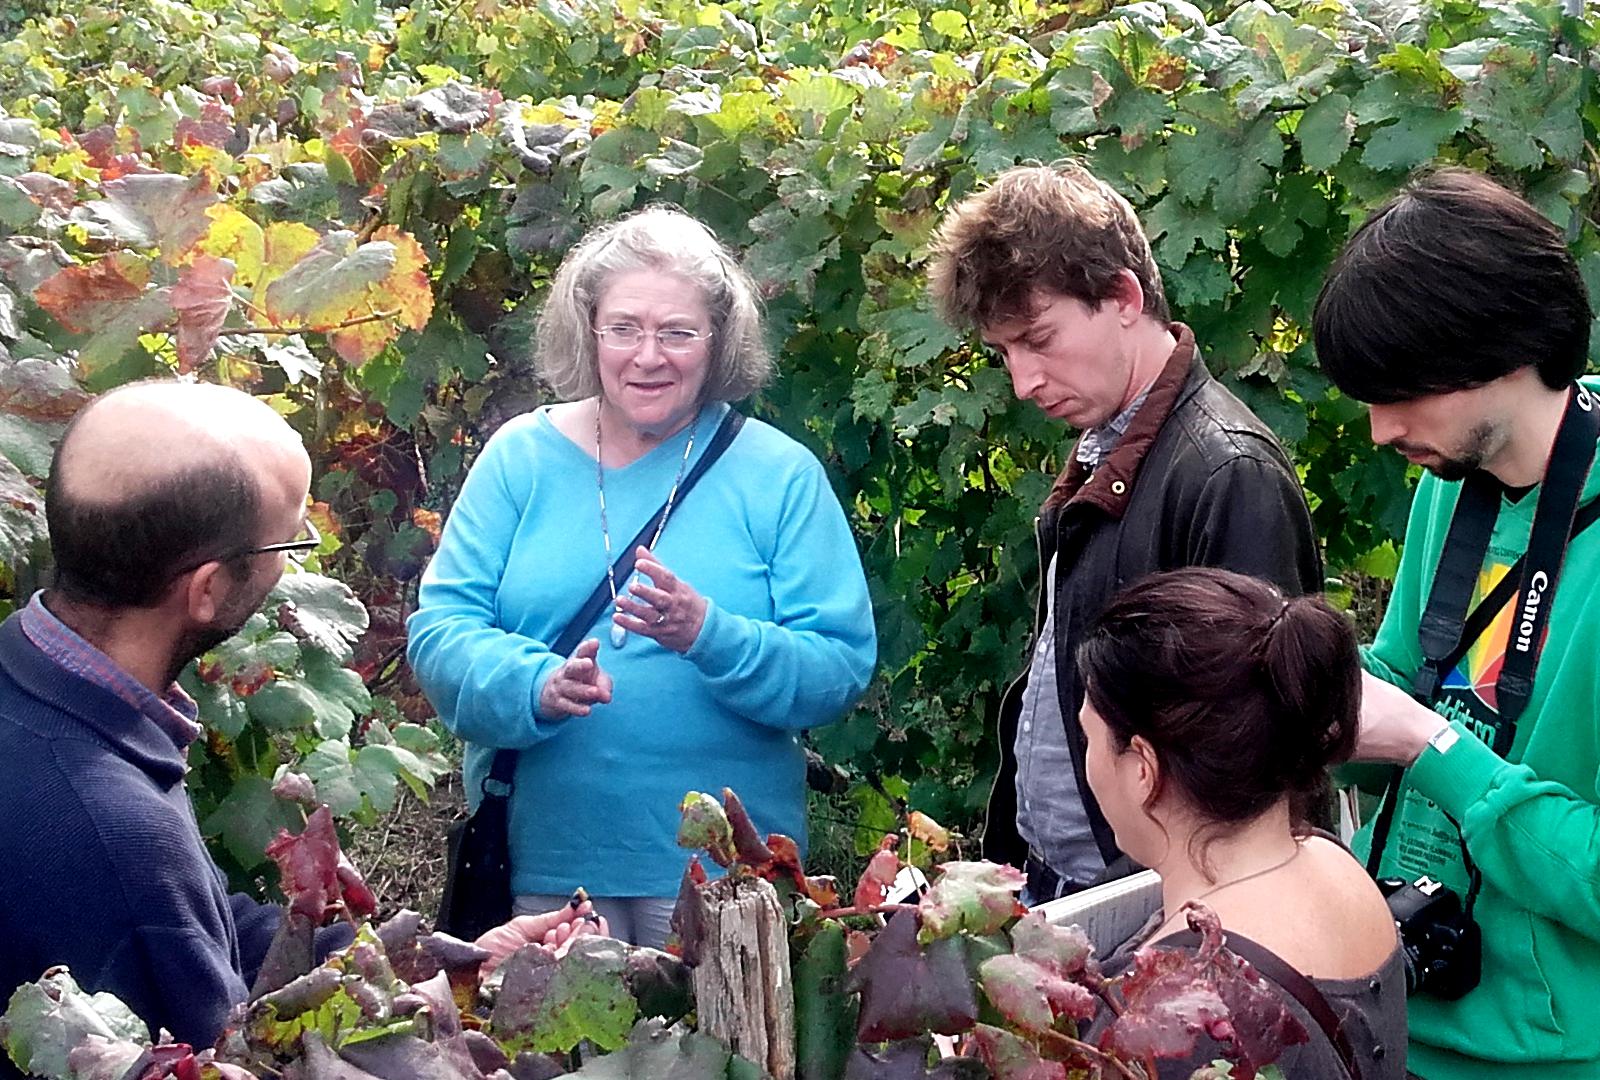 Angela Muir, Master of Wine visita D.O. Ribeiro.